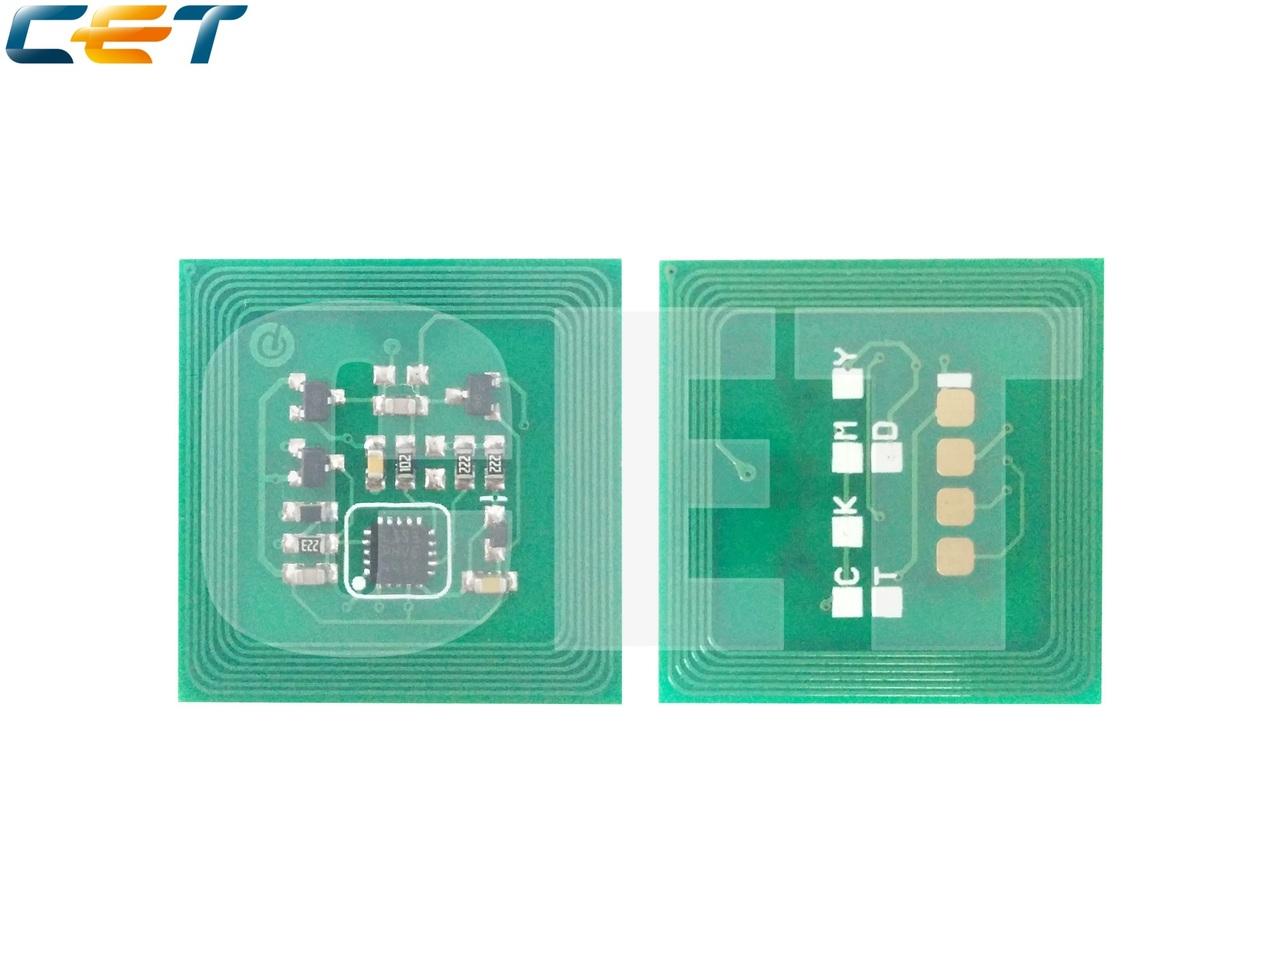 Чип картриджа 006R01451 для XEROX DocuColor240/242/250/252/260, WorkCentre7655/7665/7675/7755/7765/7775 (CET) Magenta, (W.EU), 34000стр., CET1409M